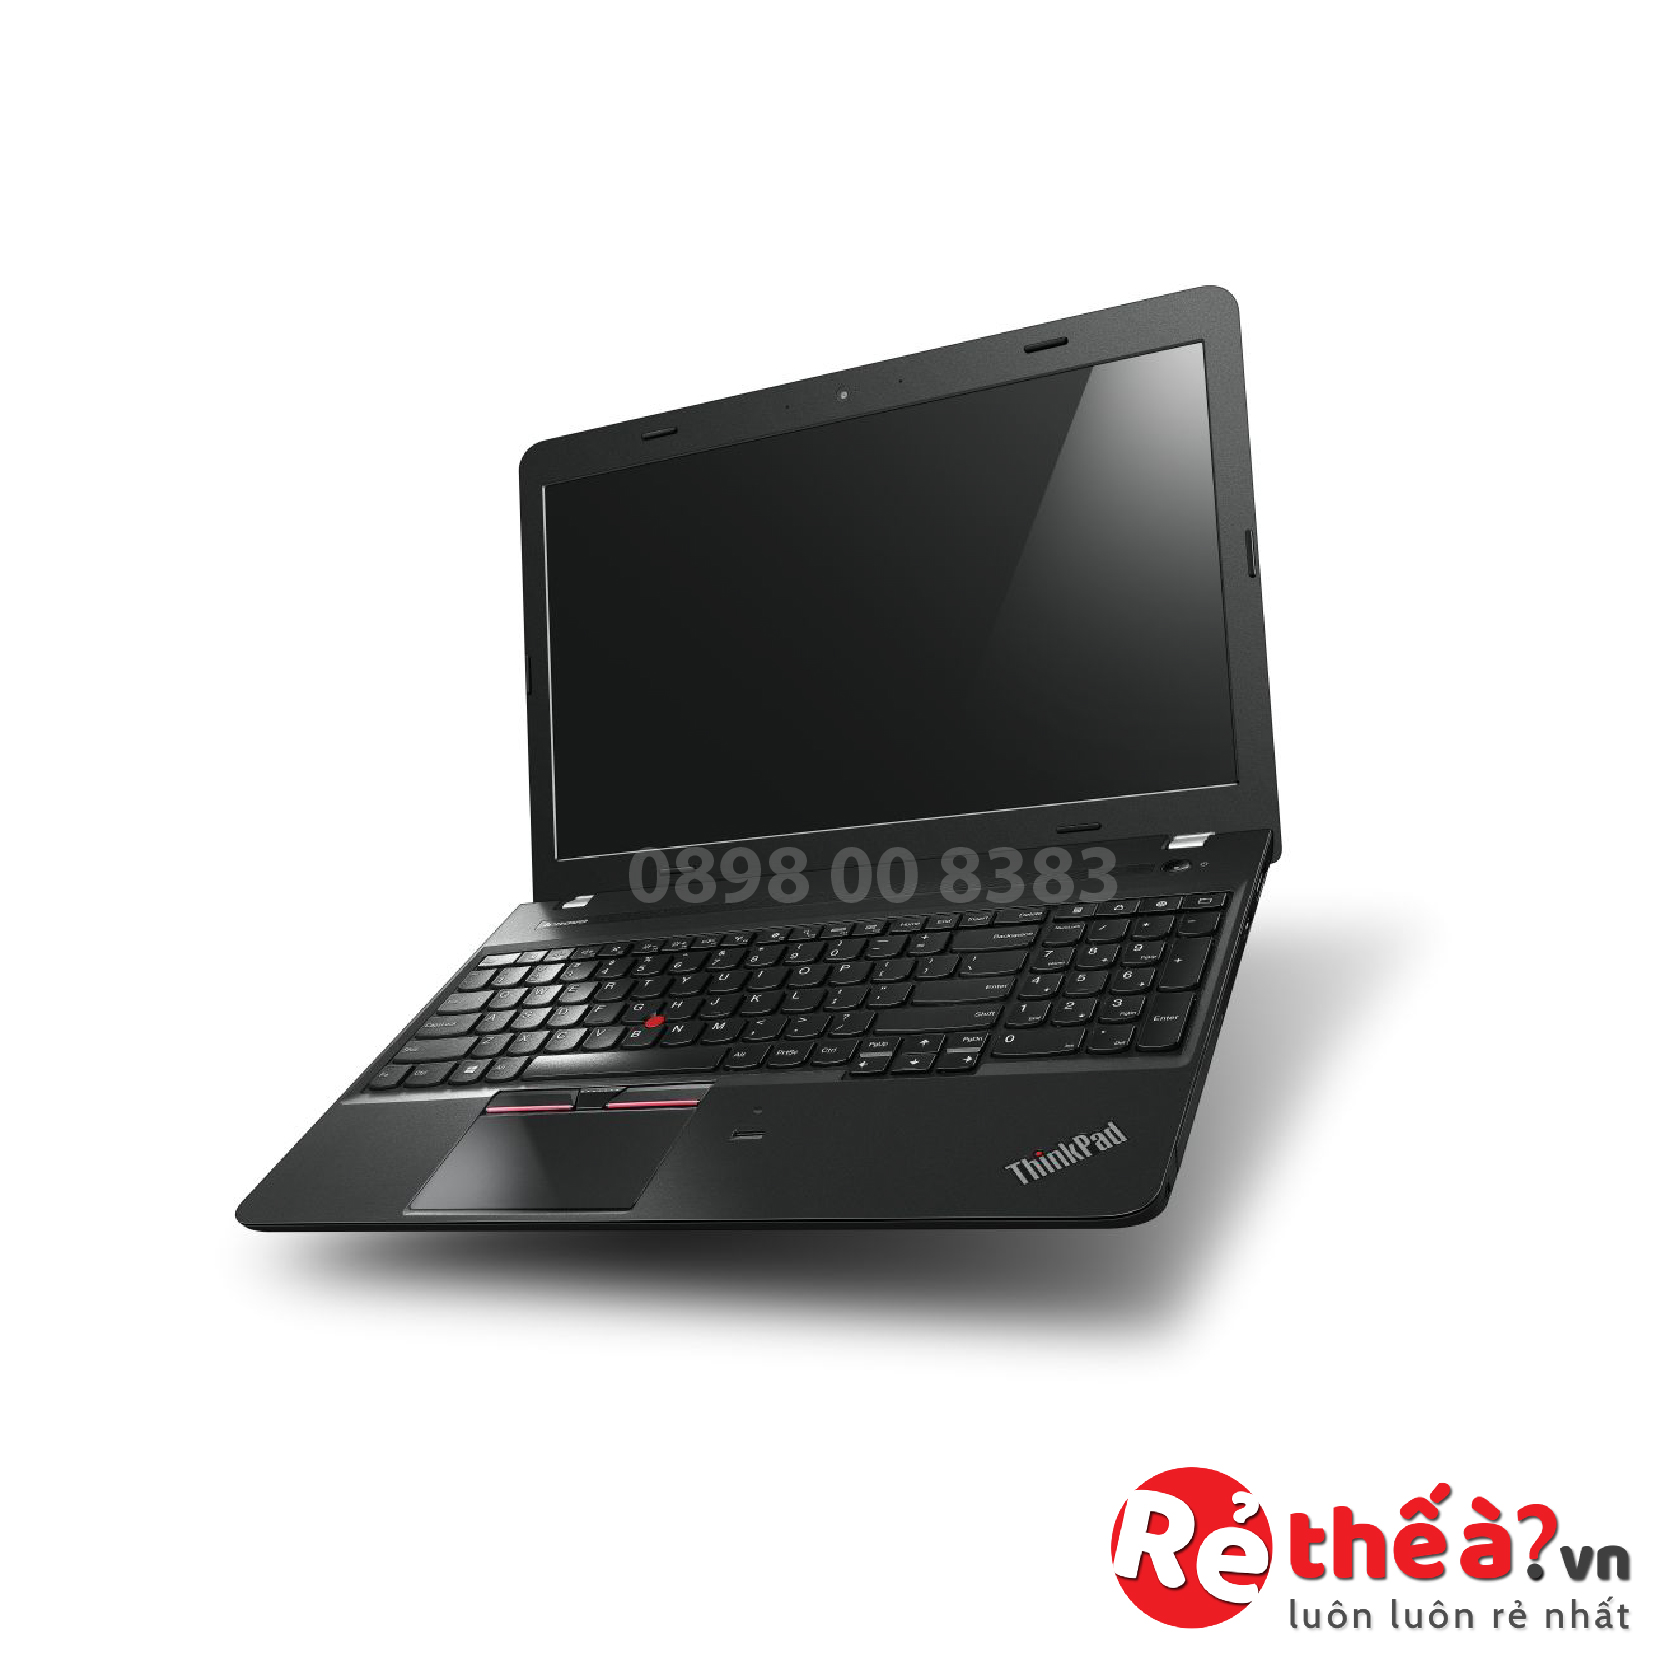 Laptop Lenovo Thinkpad E550